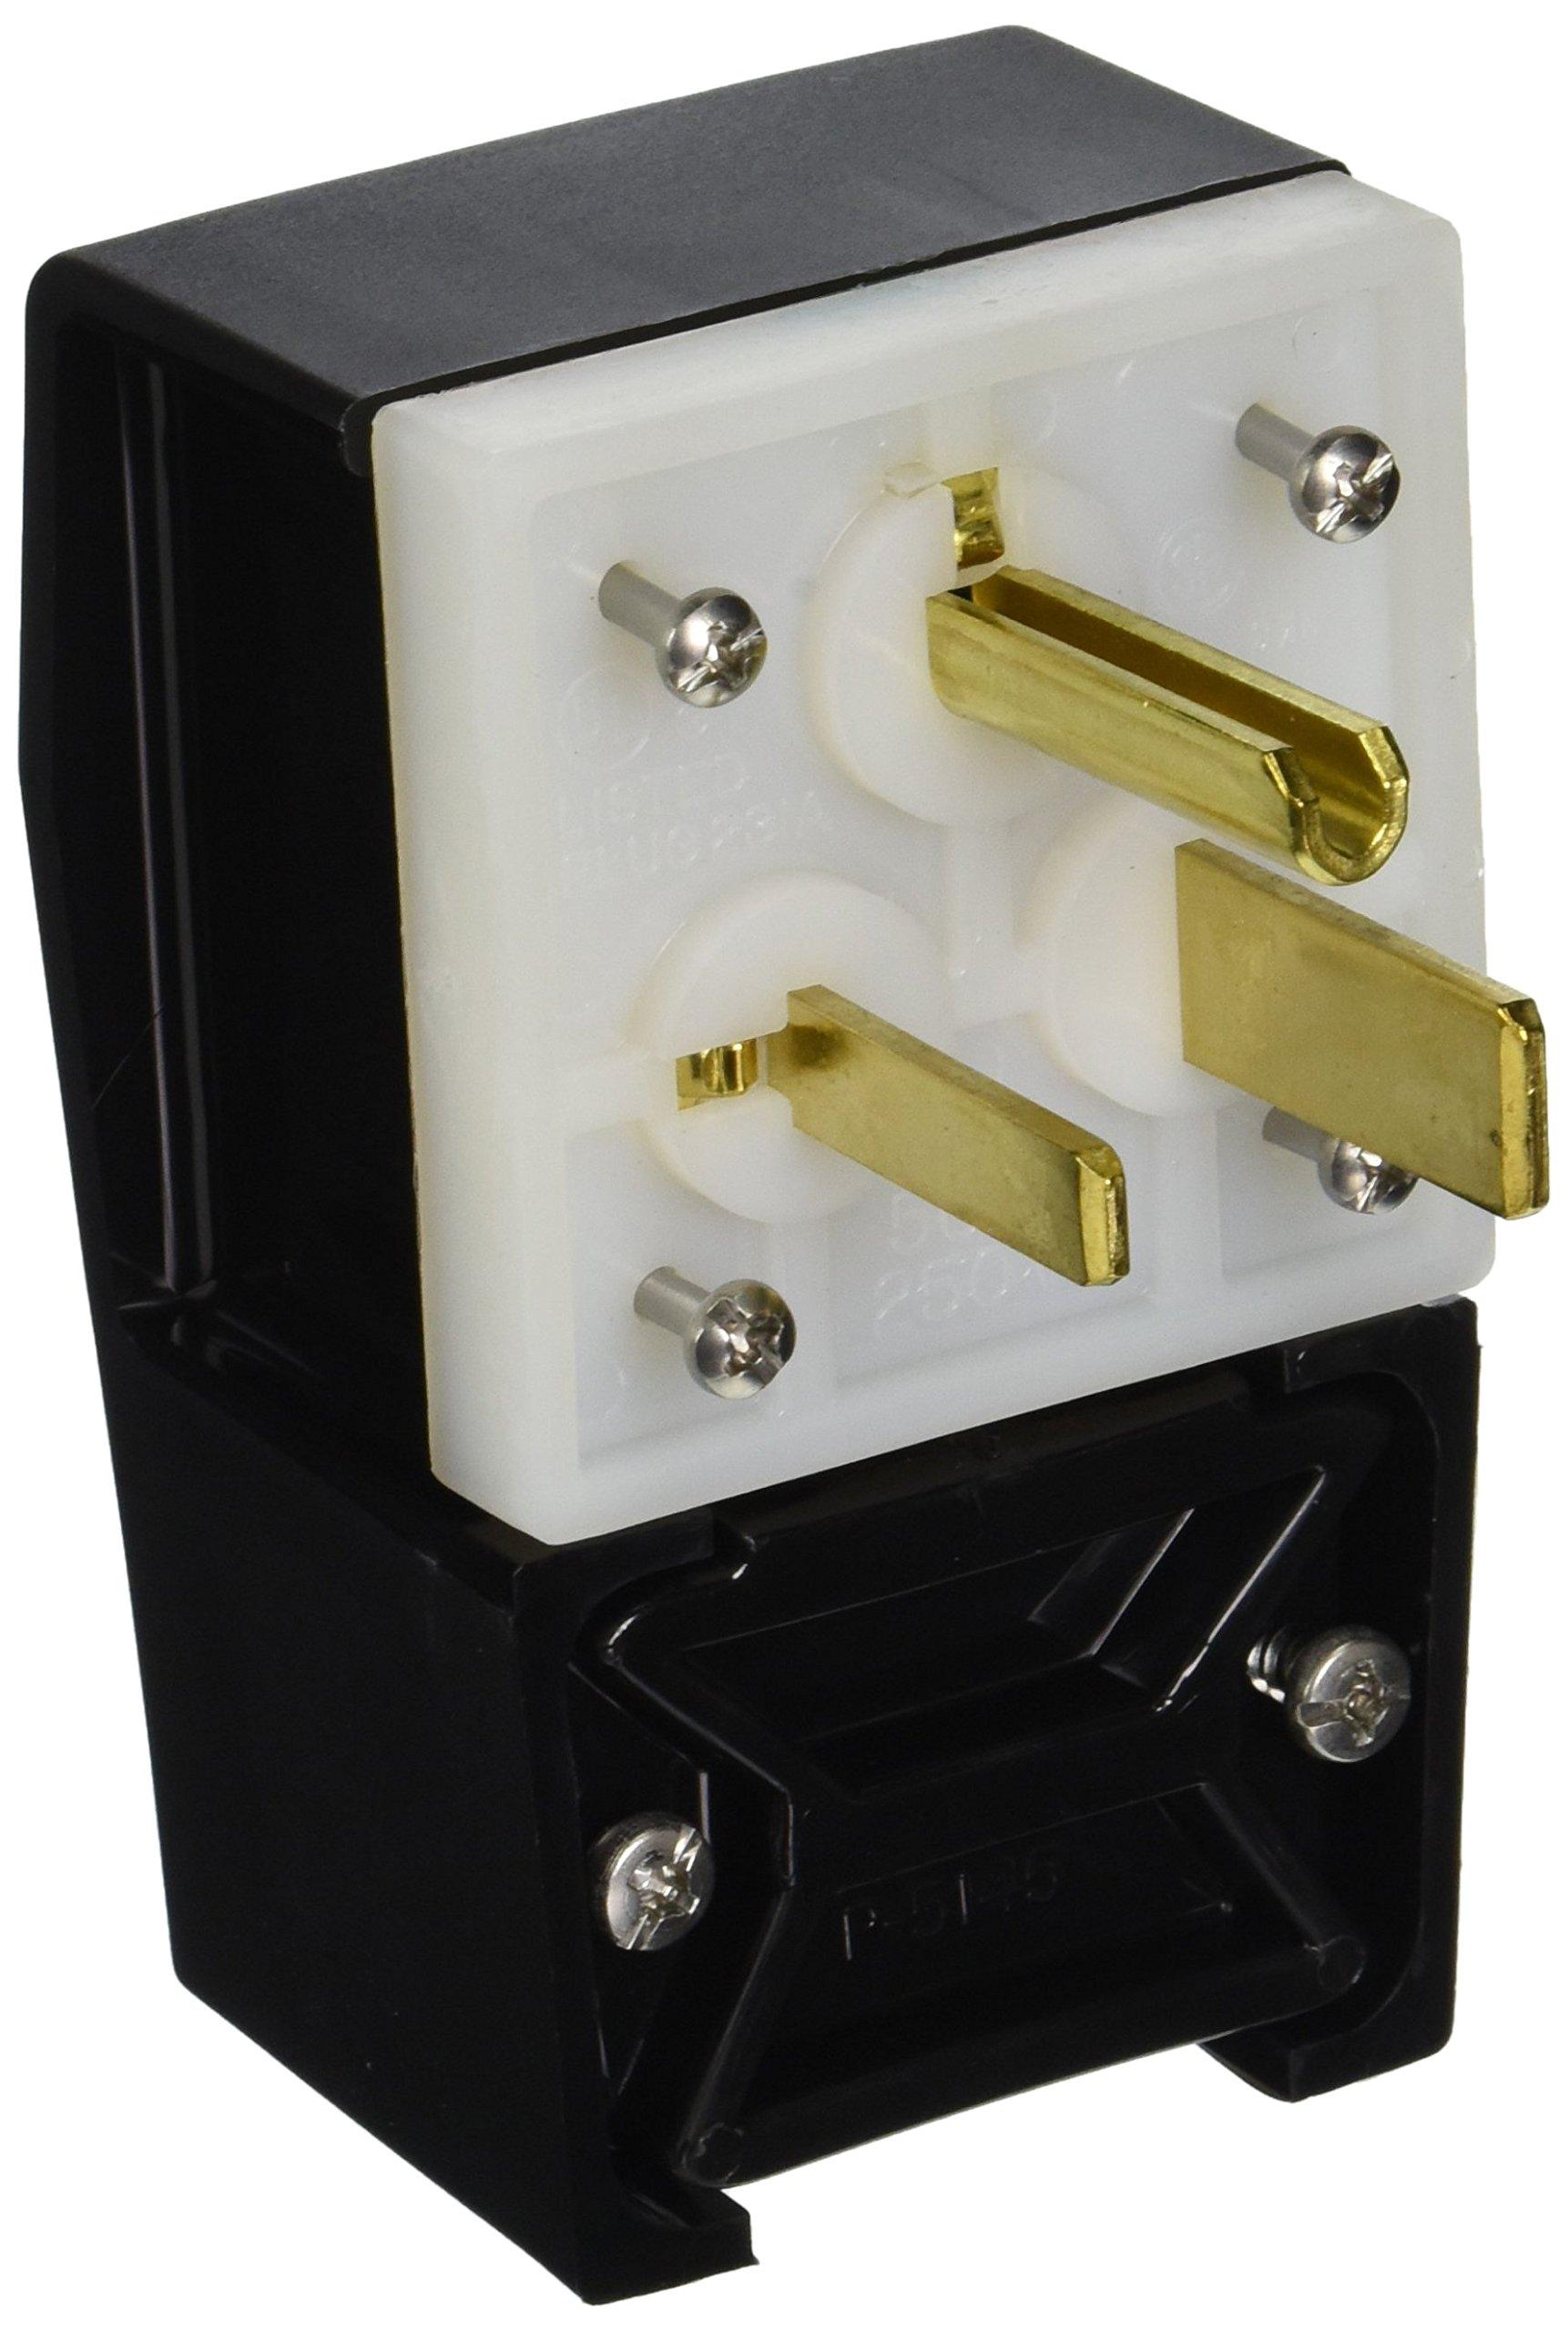 Hubbell HBL9368 Plug, Angle, 2 Pole, 3 Wire, 50 amp, 250V, 6-50P, Black